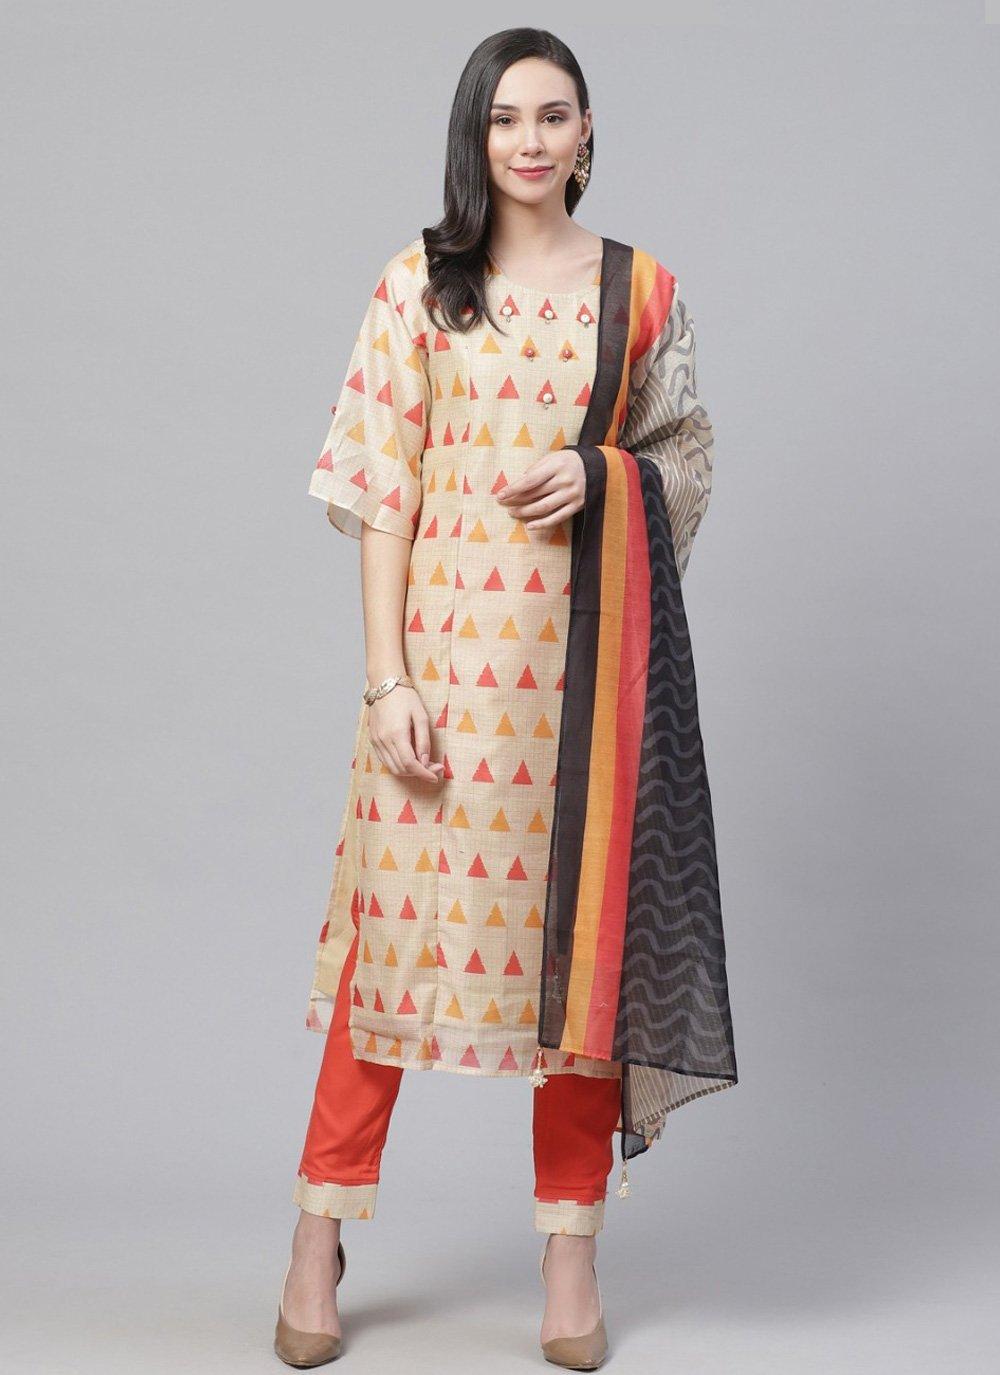 Chanderi Digital Print Designer Salwar Kameez in Multi Colour